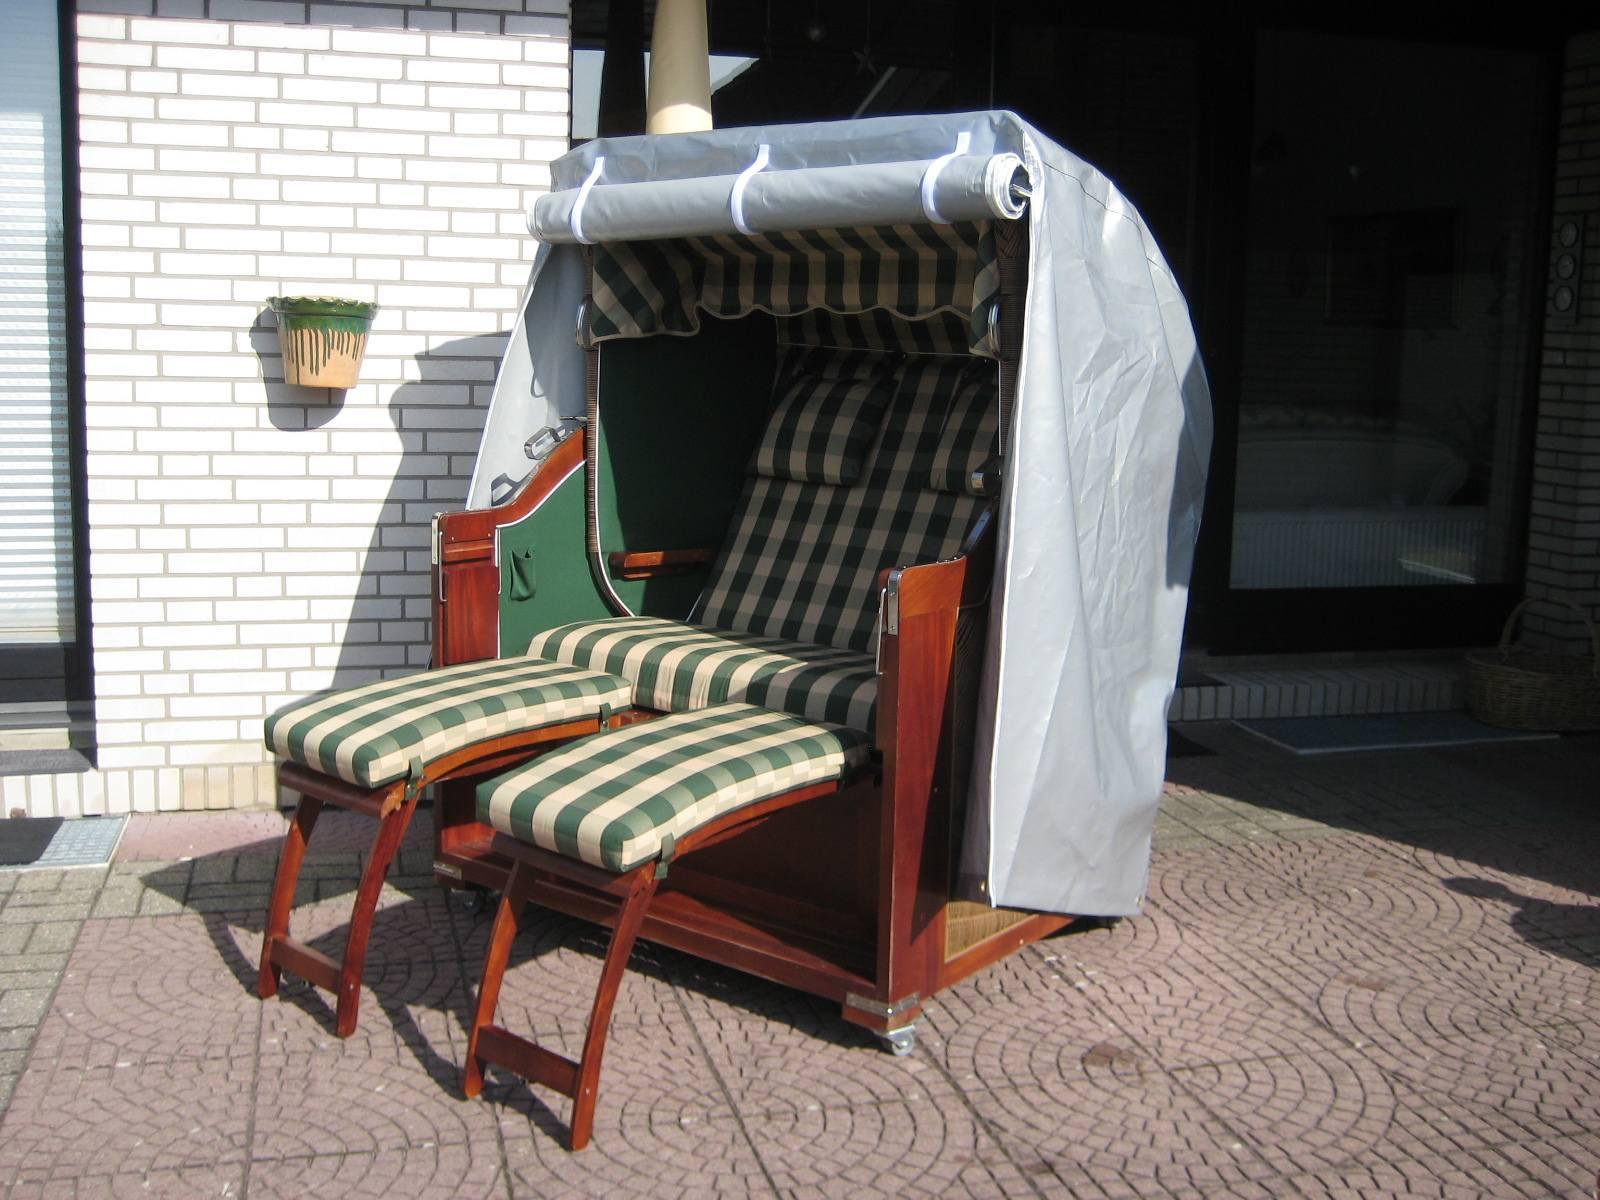 hochwertige strandkorbhaube aus pvc planen shop24. Black Bedroom Furniture Sets. Home Design Ideas